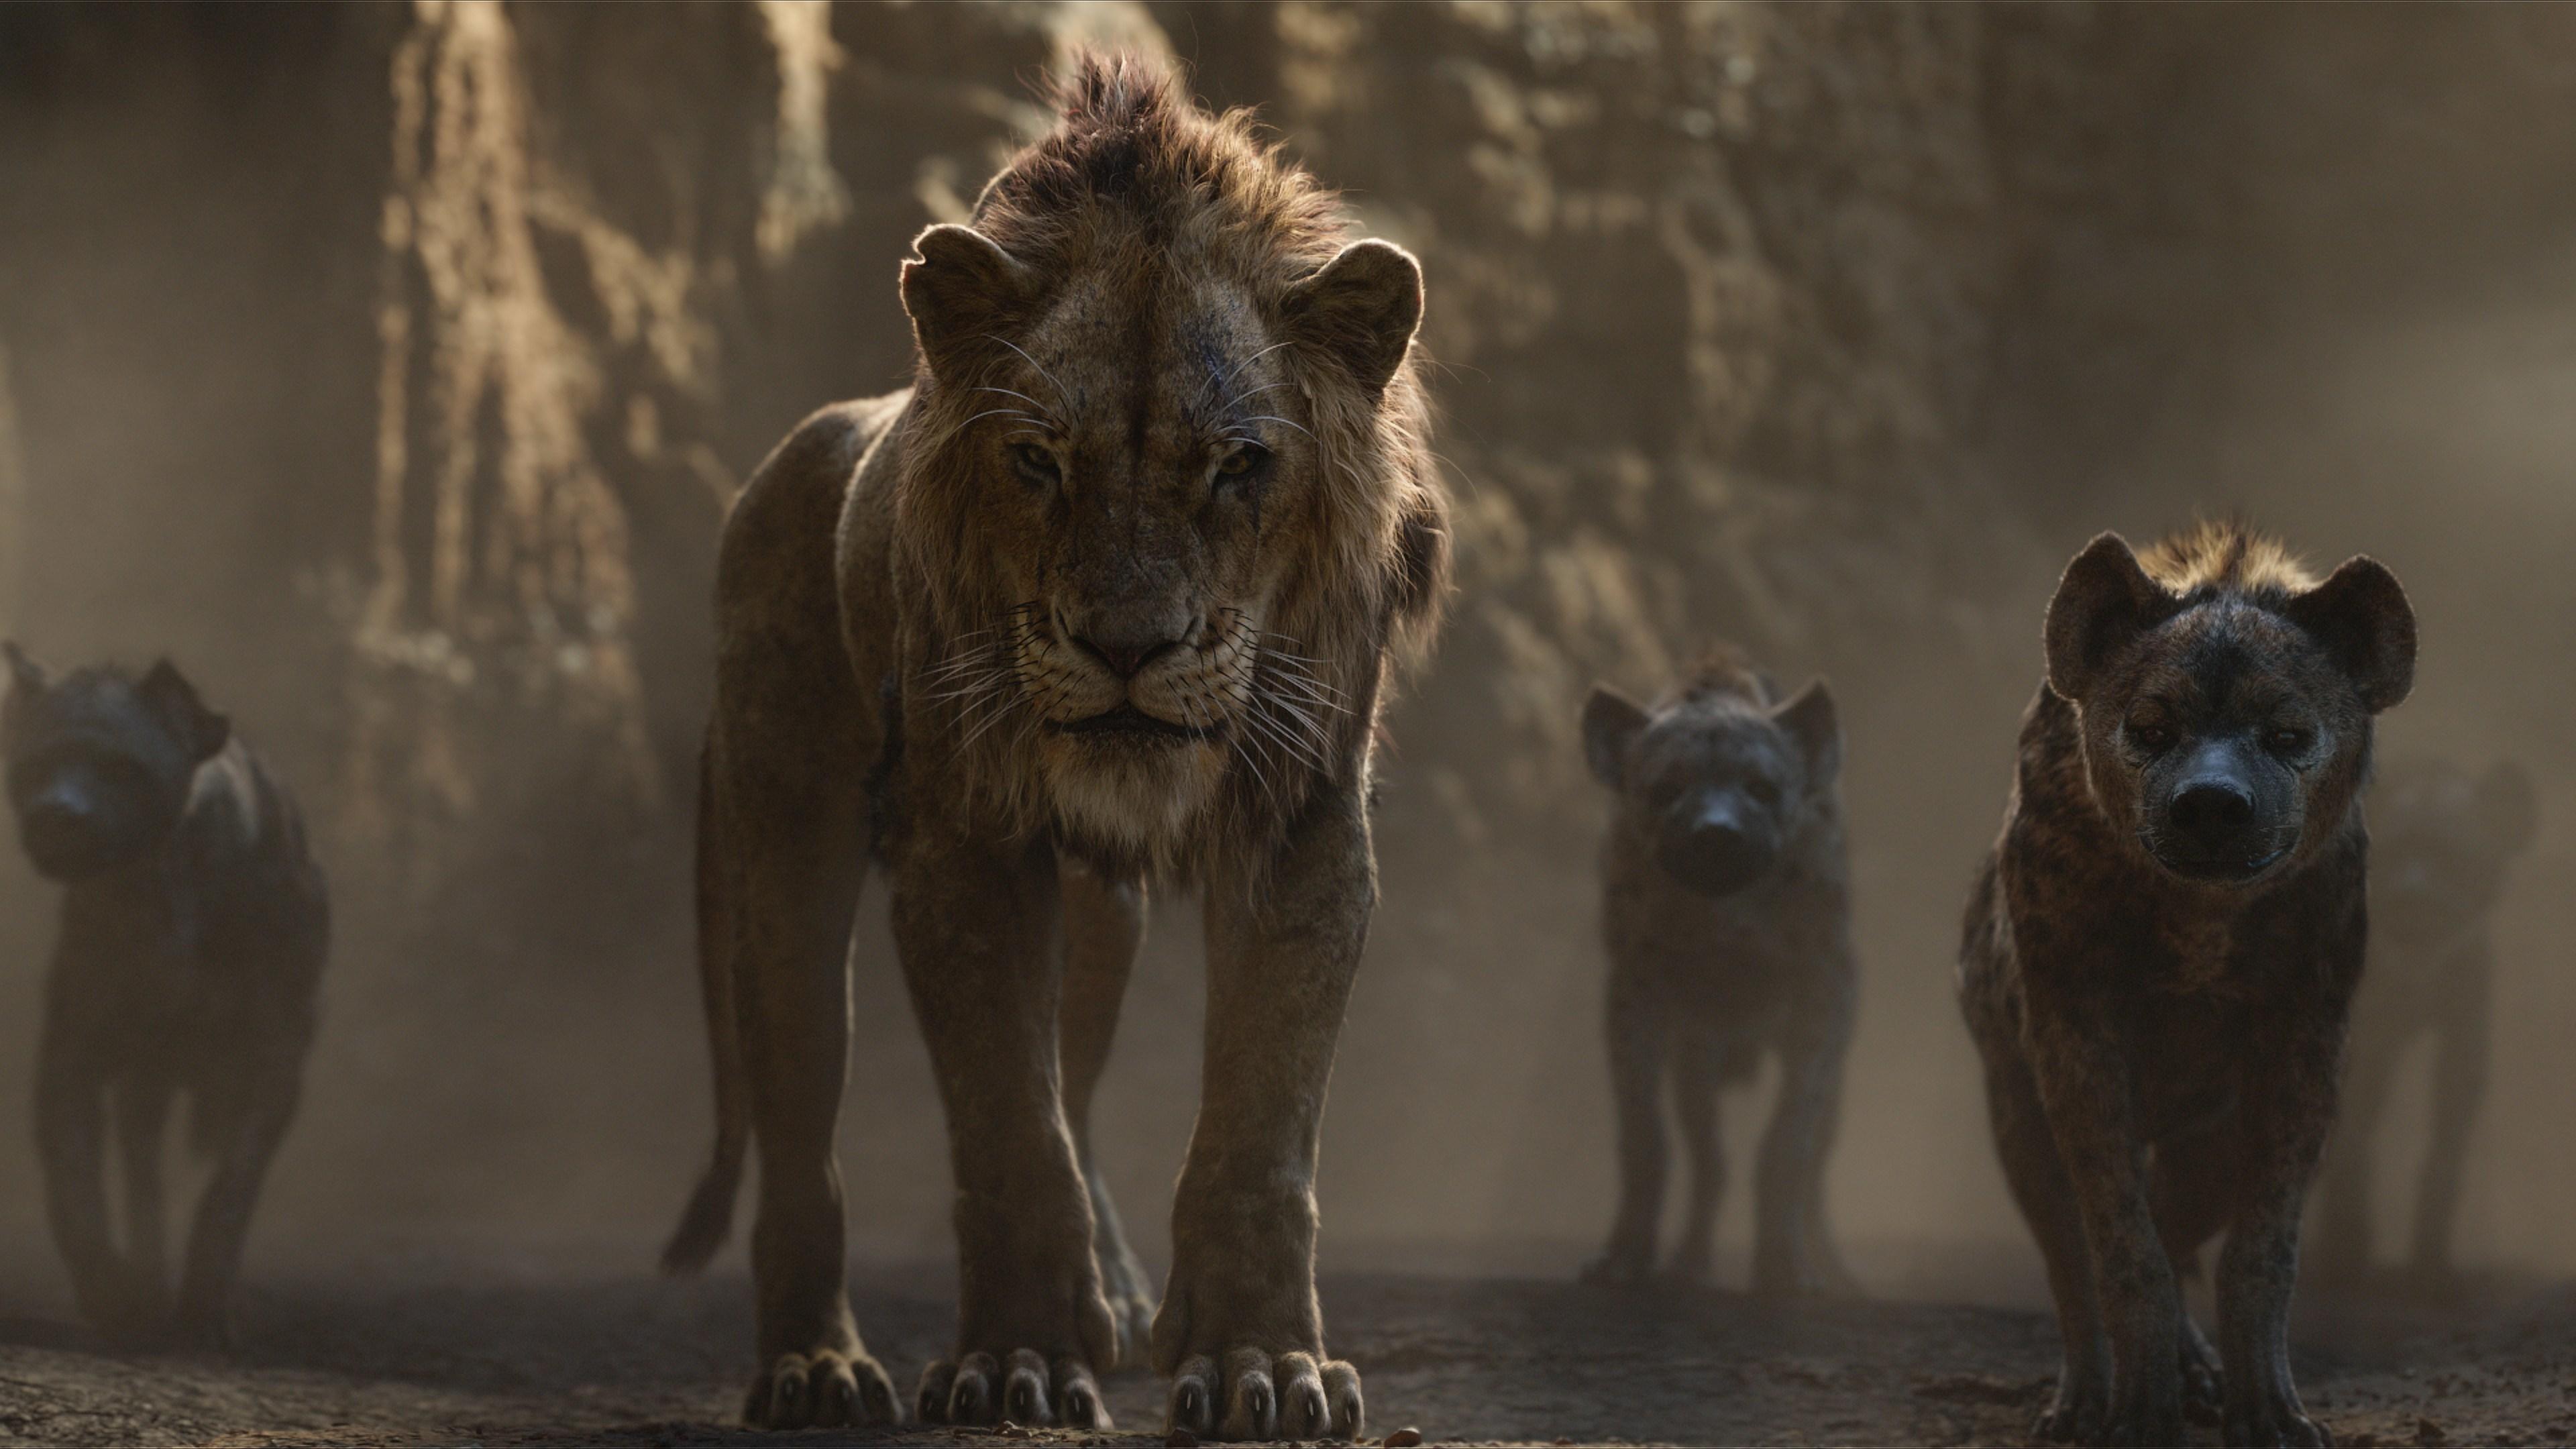 the lion king 2019 scar 1565055662 - The Lion King 2019 Scar - the lion king wallpapers, movies wallpapers, lion wallpapers, hd-wallpapers, disney wallpapers, 4k-wallpapers, 2019 movies wallpapers